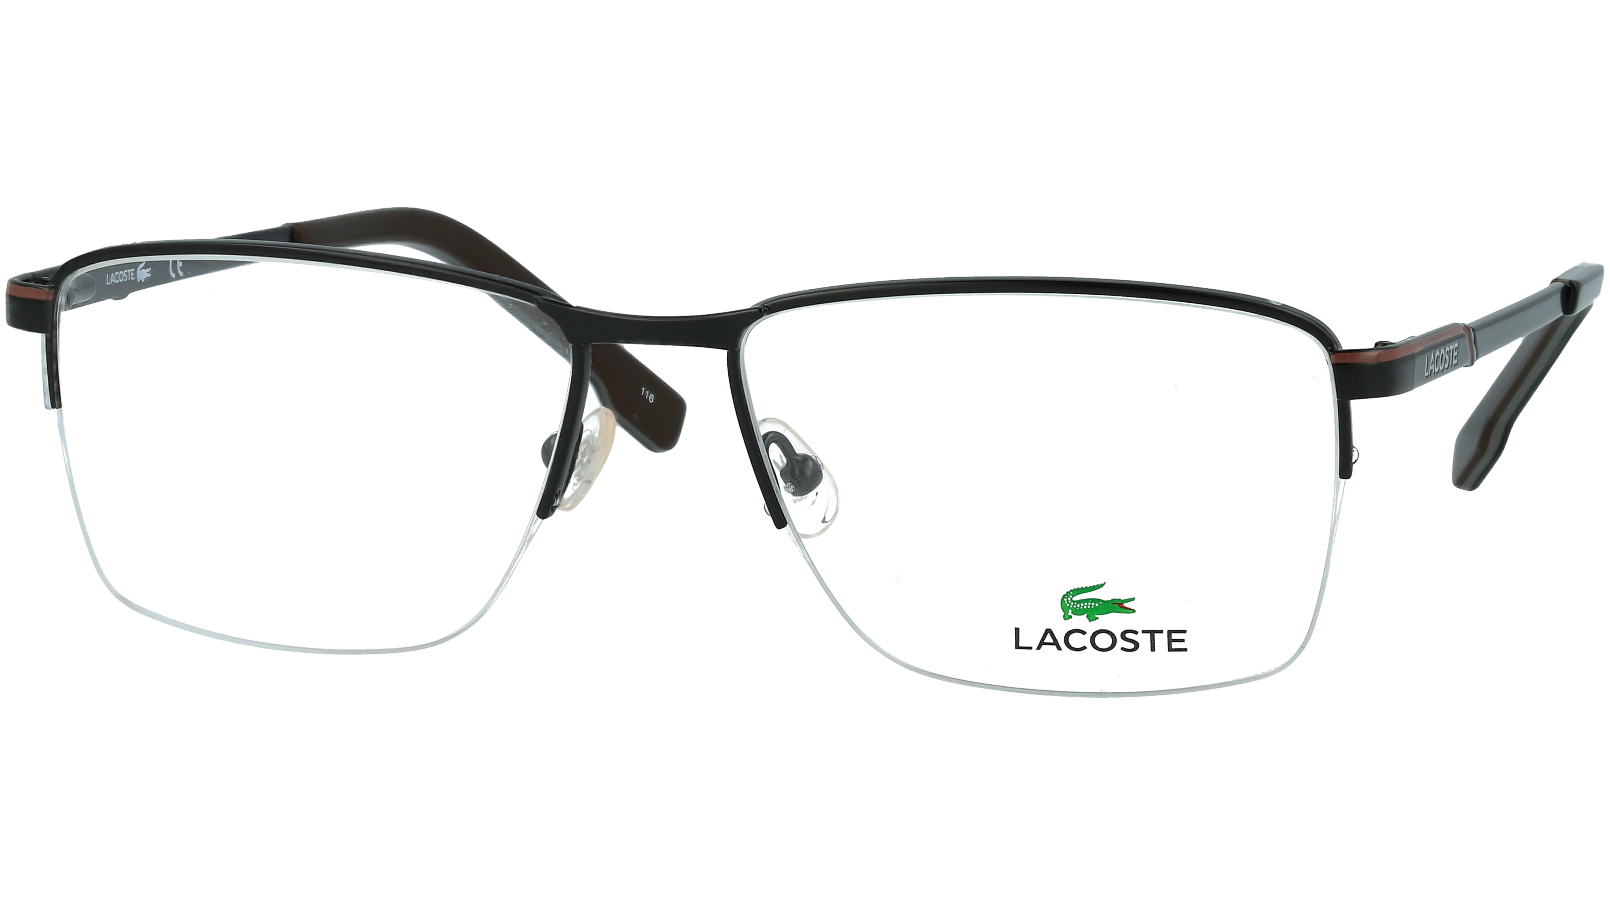 LACOSTE L2198 001 55 BLACK Glasses